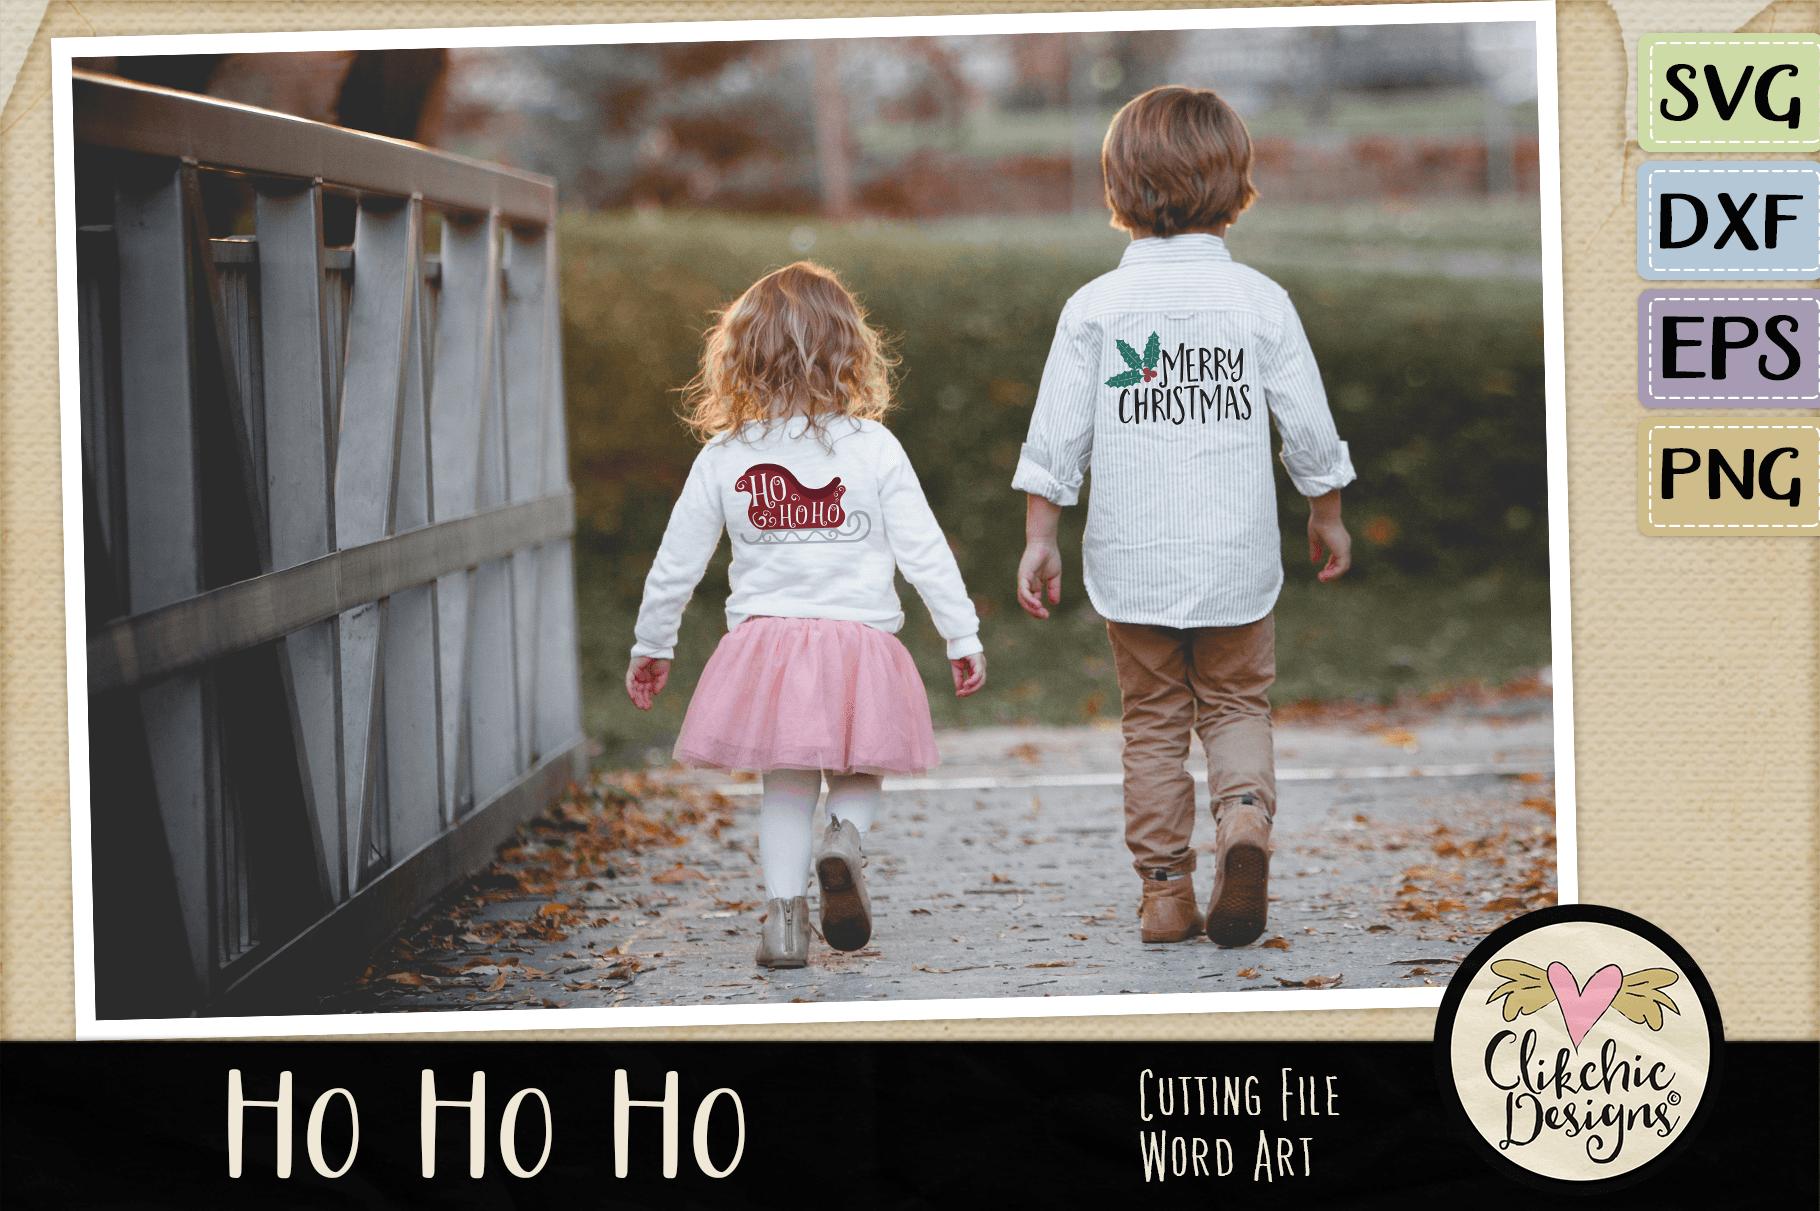 Chistmas SVG - Ho Ho Ho Santa's Sleigh Word Art Clipart example image 3